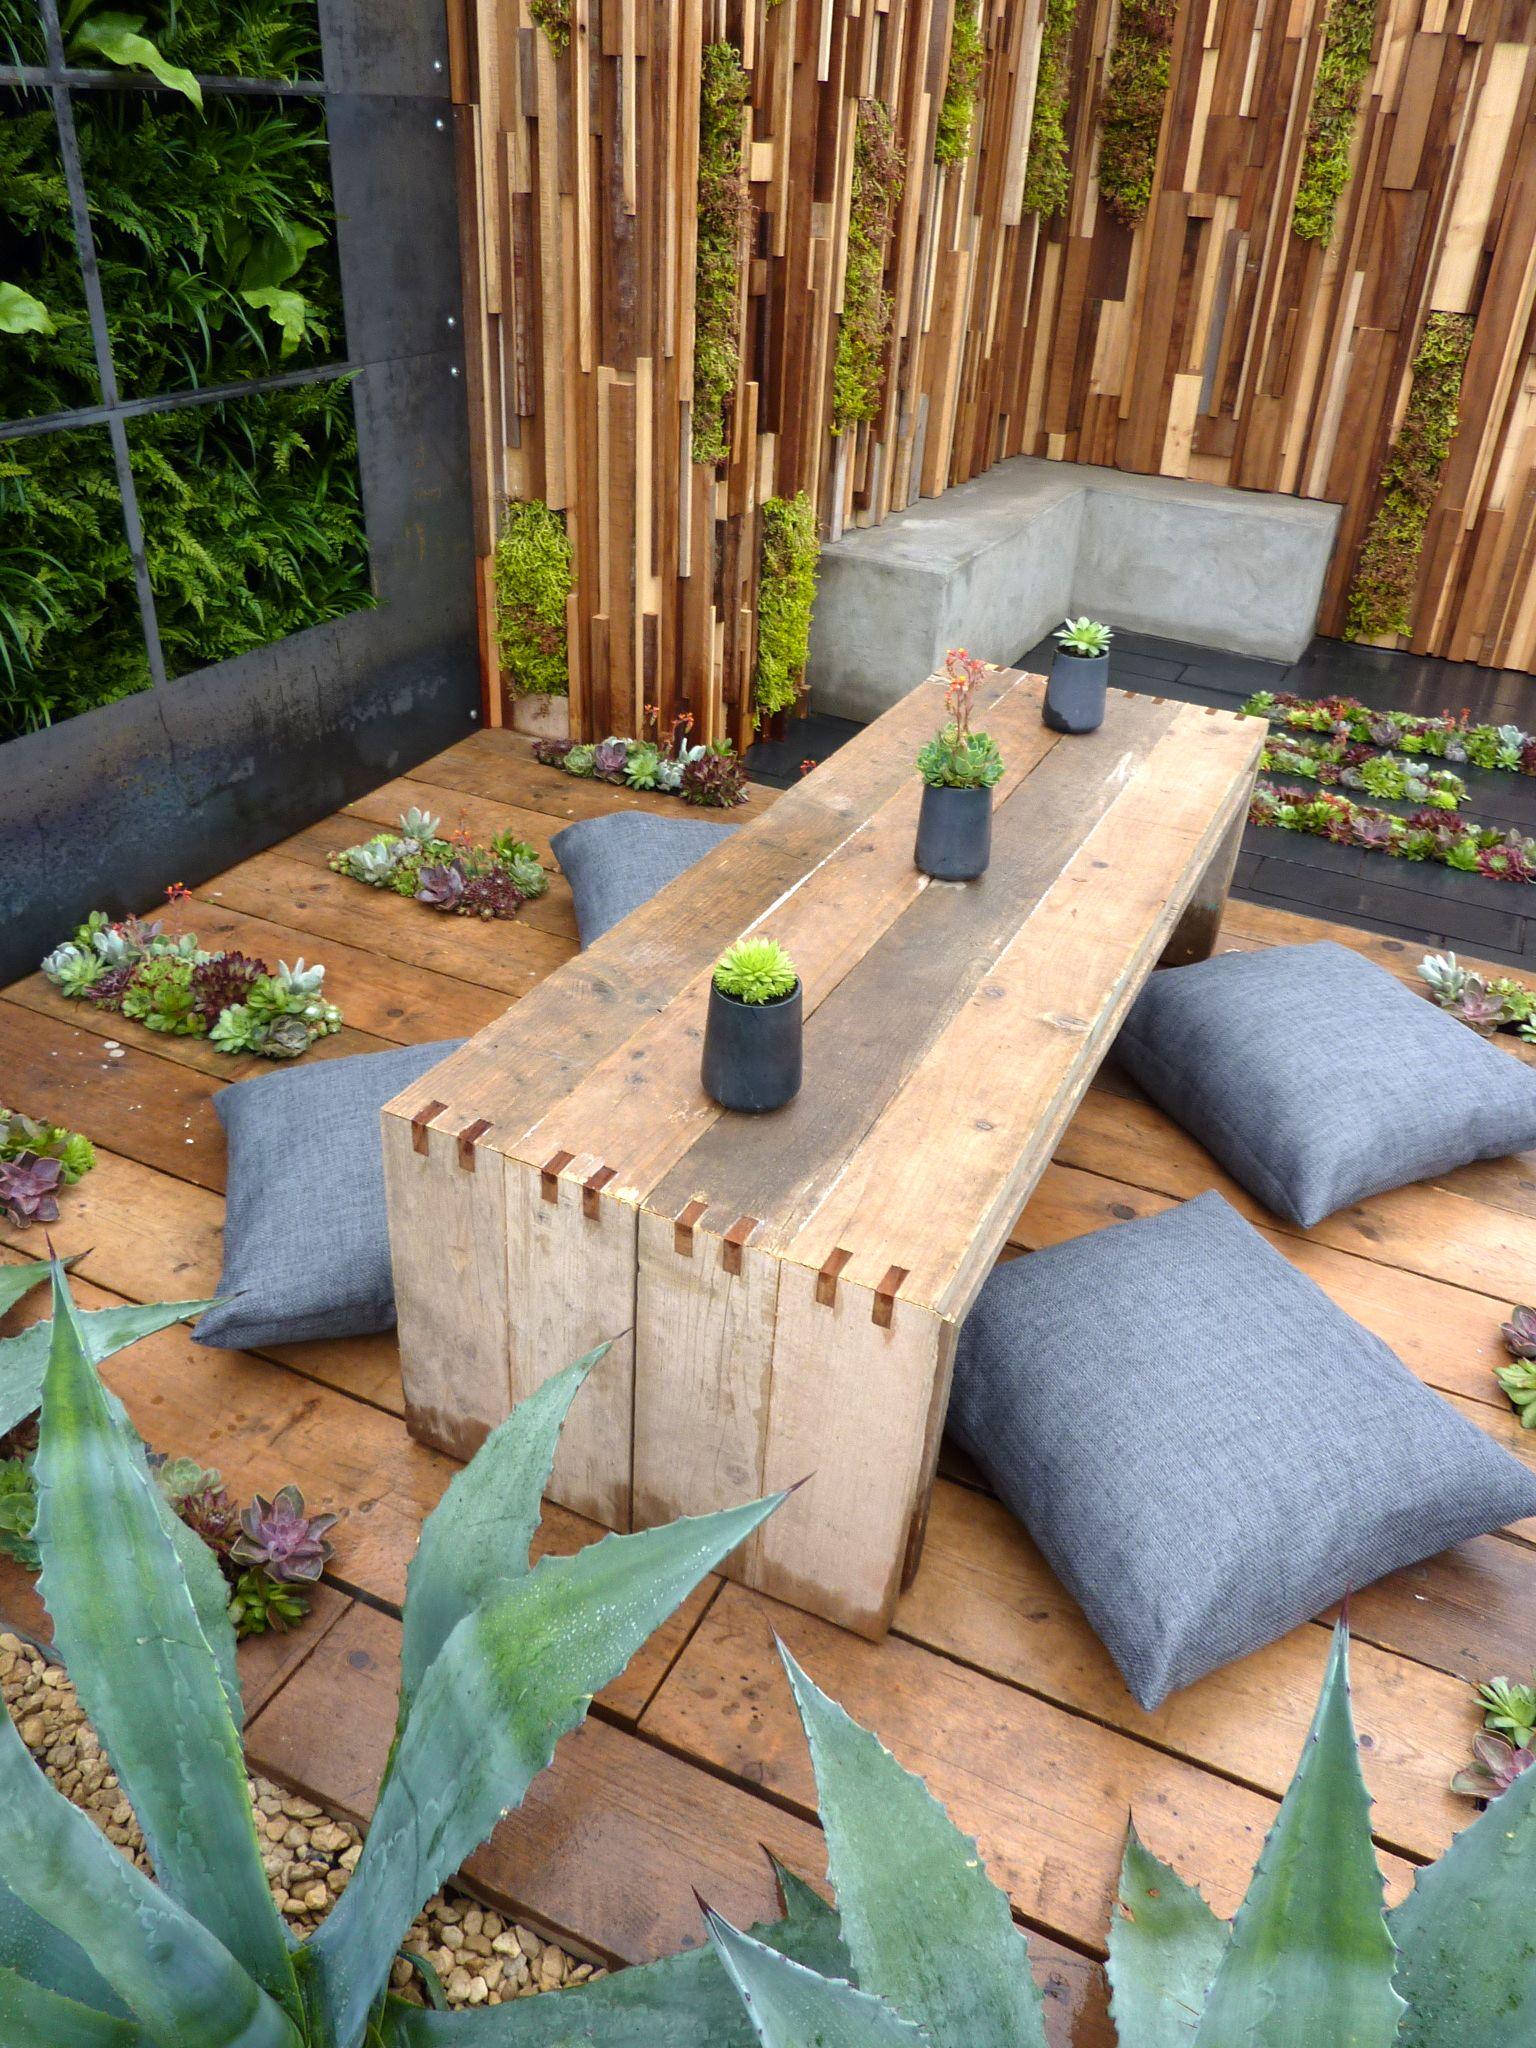 Scaffold Board Deck And Furniture Garden Designed By Jade Goto Landsape Studio Furniture Construction By Outdoor Meditation Meditation Garden Garden Design Diy backyard yoga studio